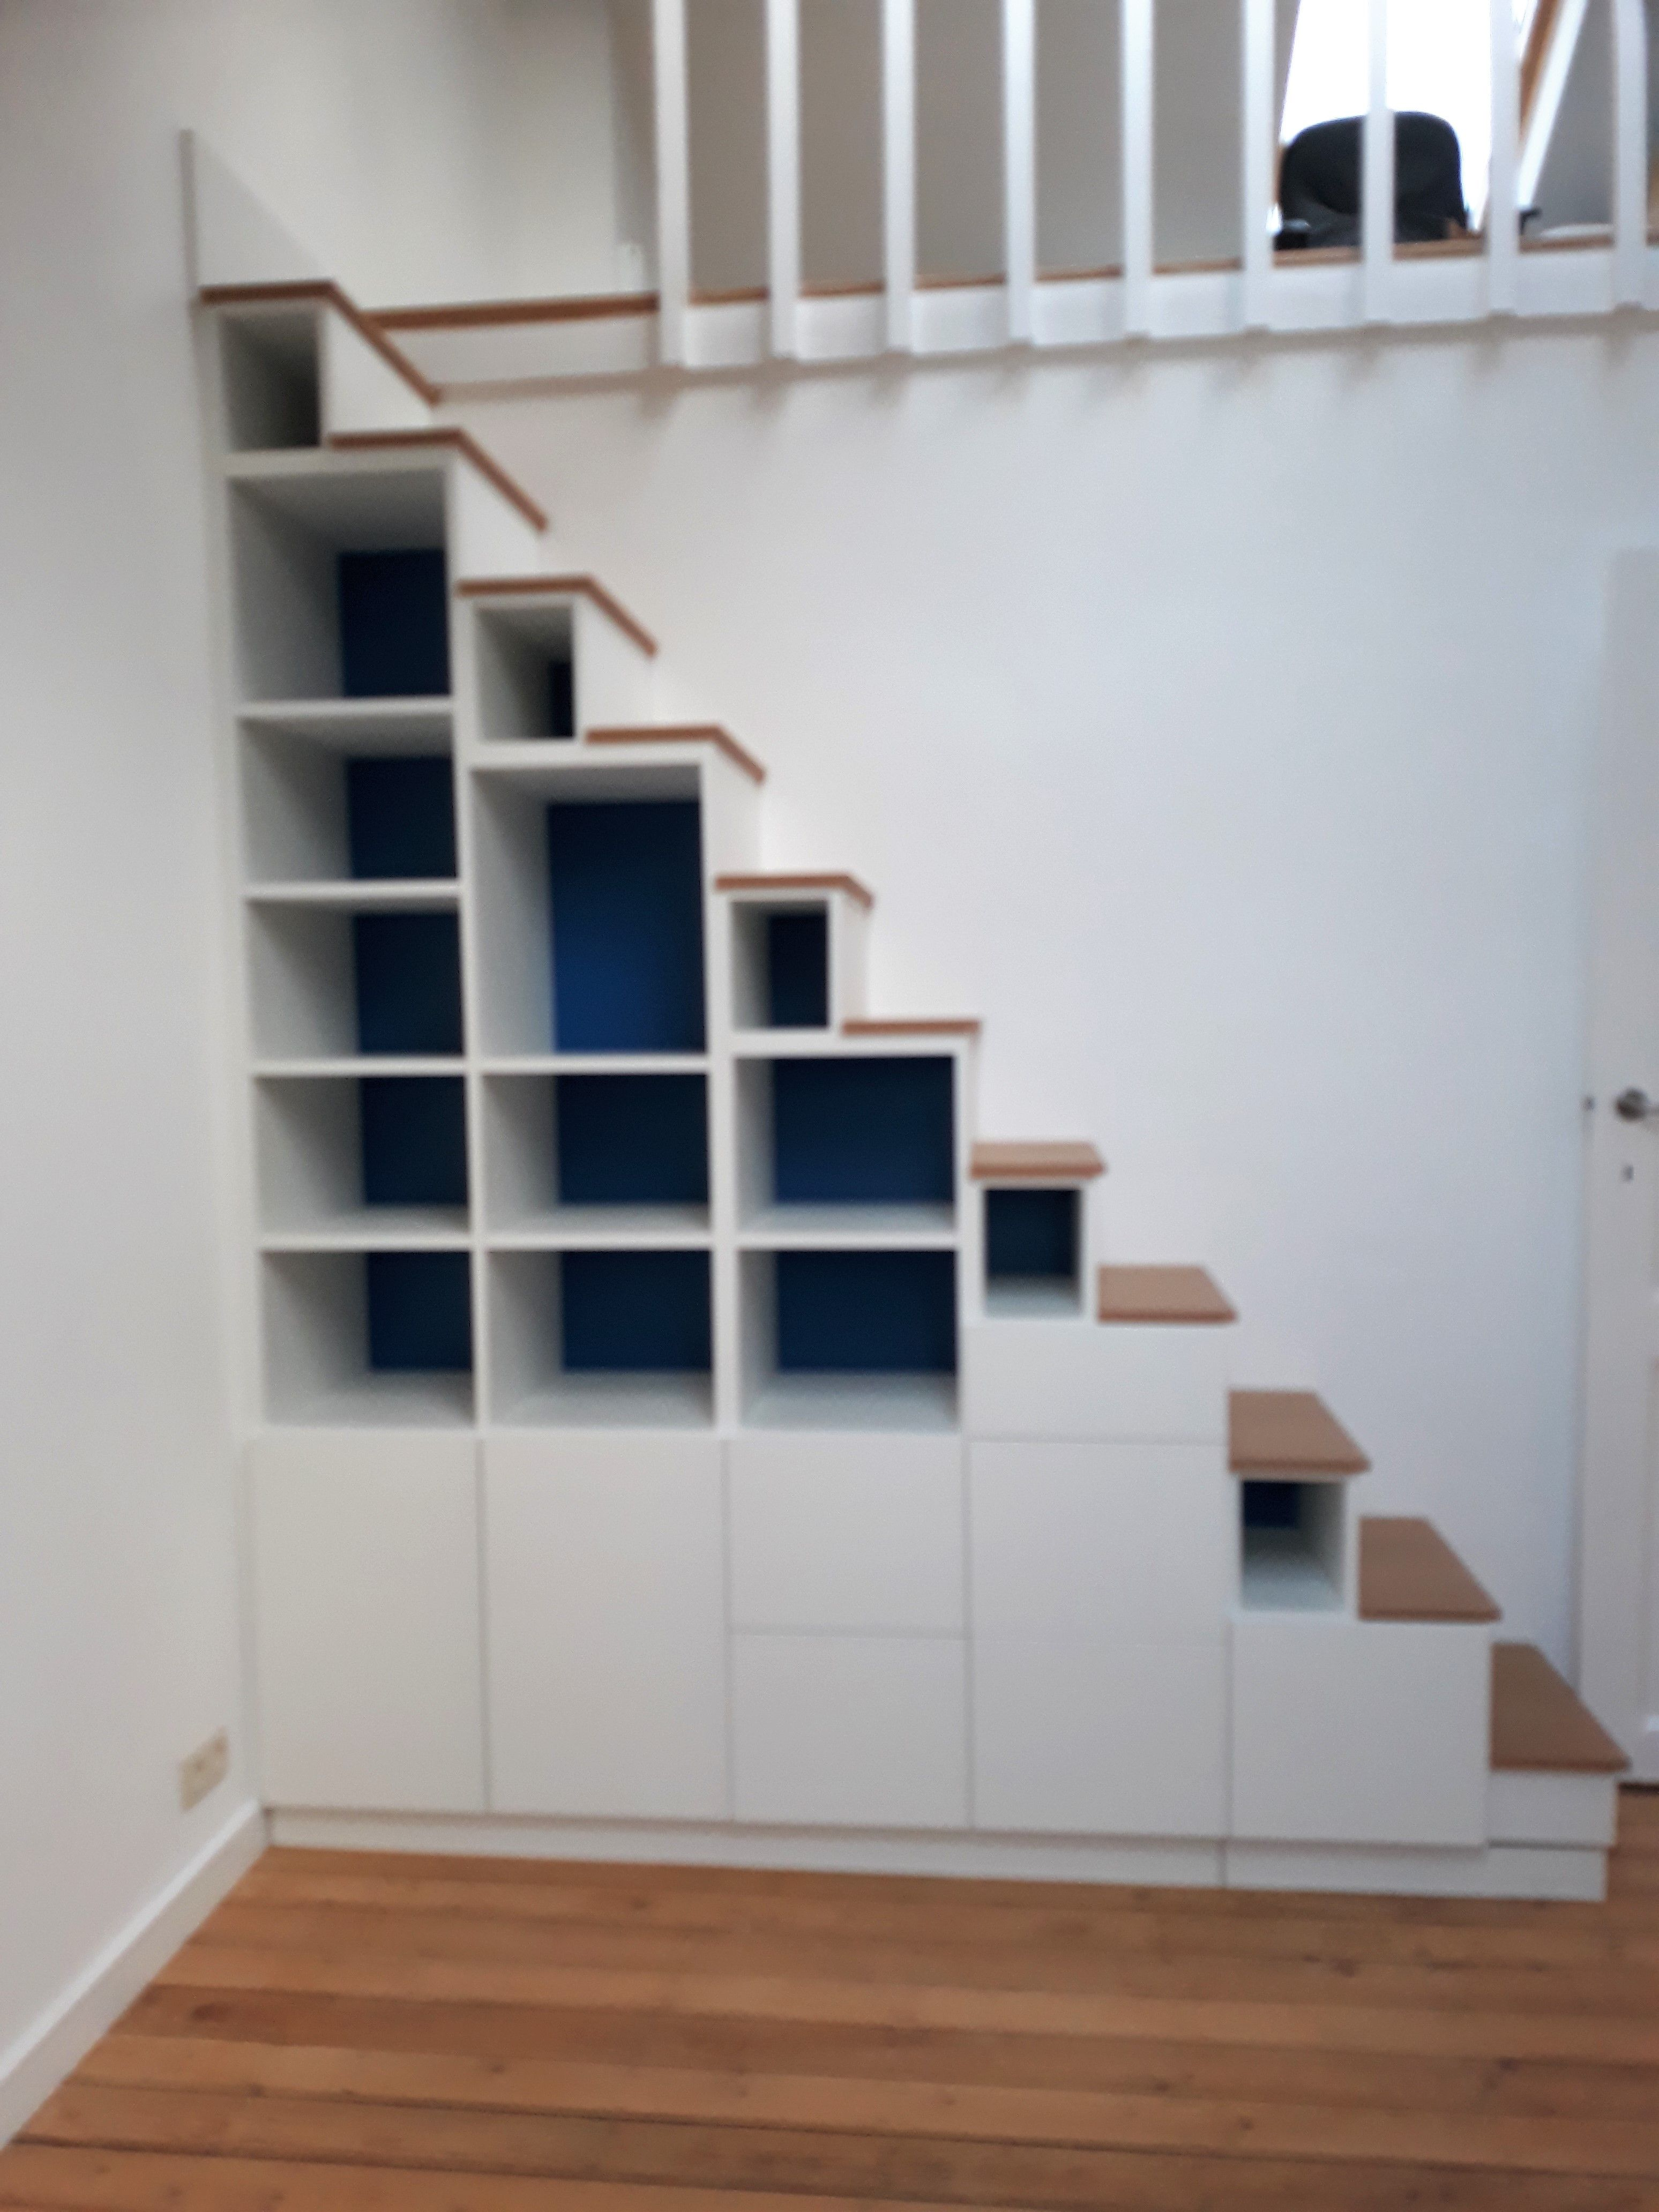 Meuble Escalier Blanc Texture Et Fond Bleu Royal Un Contraste